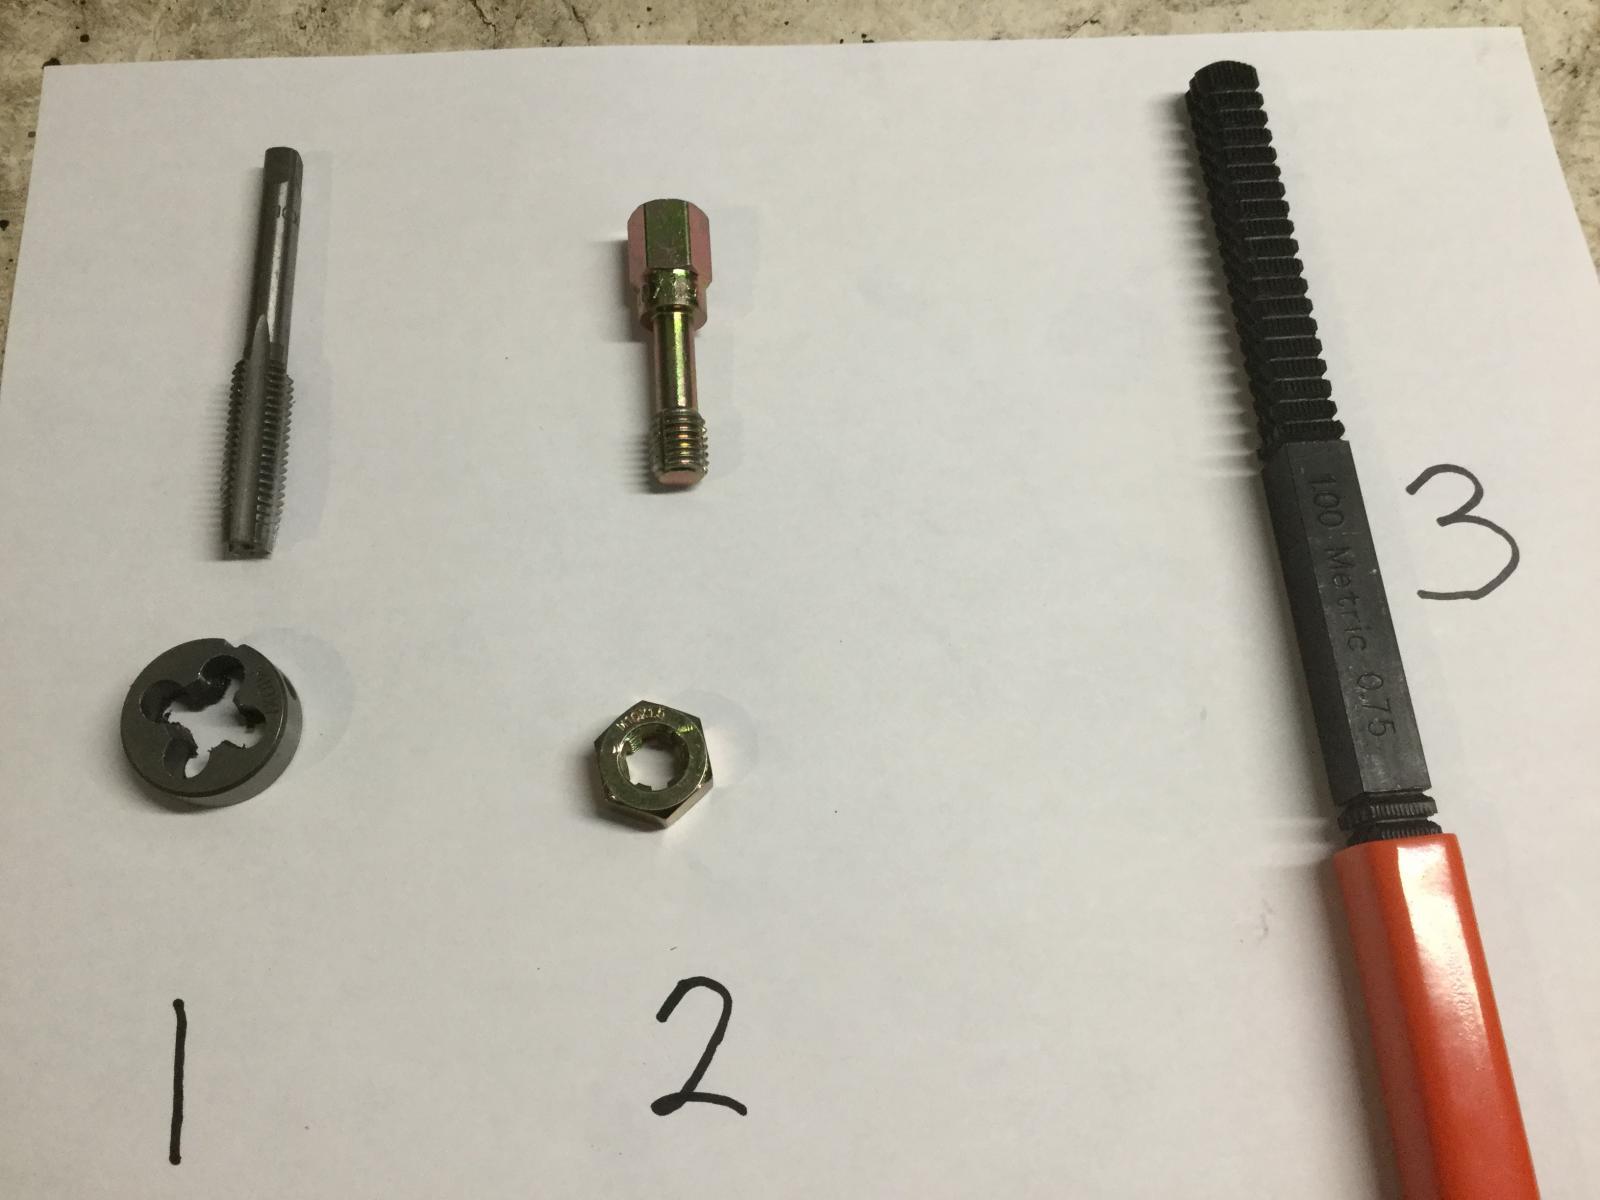 Thread restorer tools